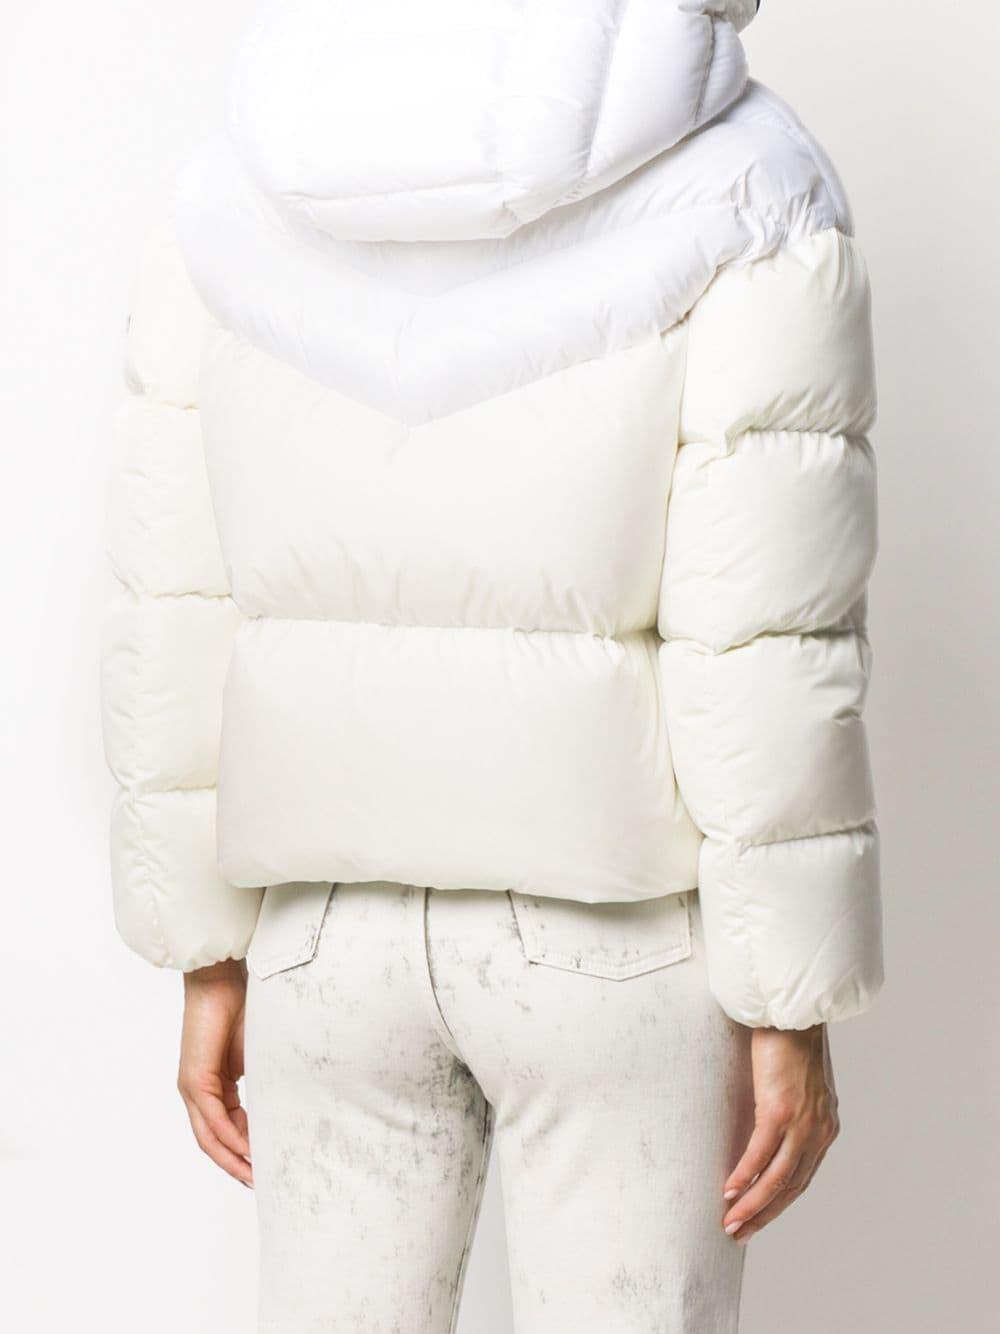 white feather hooded down Guenioc jacket MONCLER      GUENIOC 1A580-00-C0063035